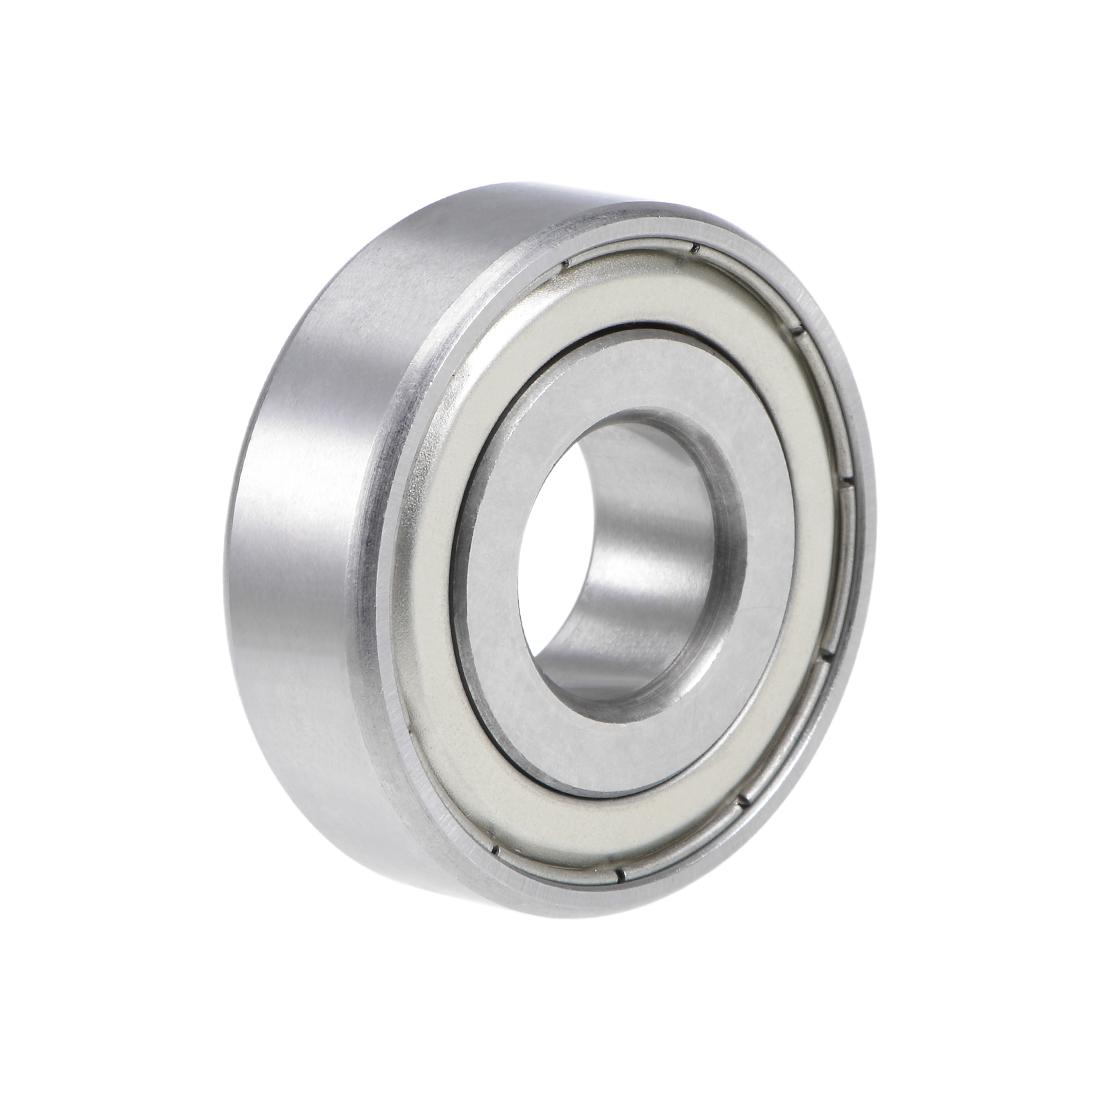 "1628ZZ Deep Groove Ball Bearing 5/8""x1-5/8""x1/2"" Double Shielded Chrome Bearings"